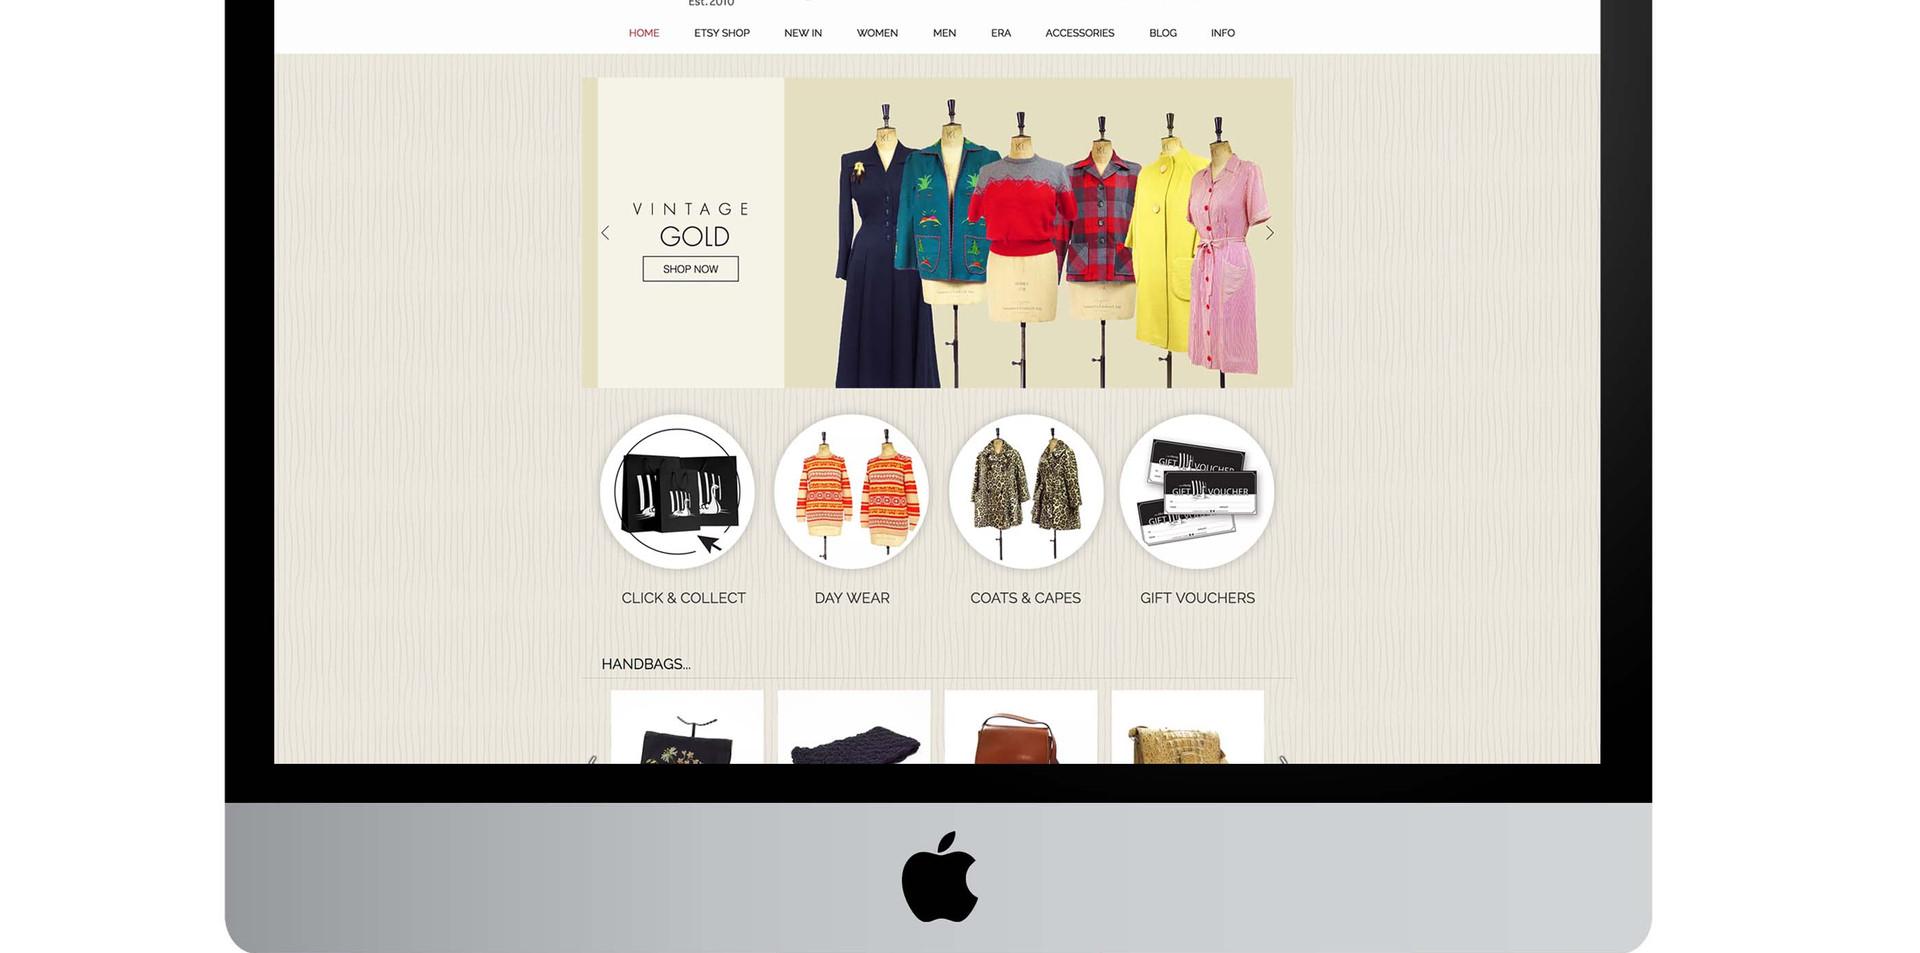 UI/UX and branding design